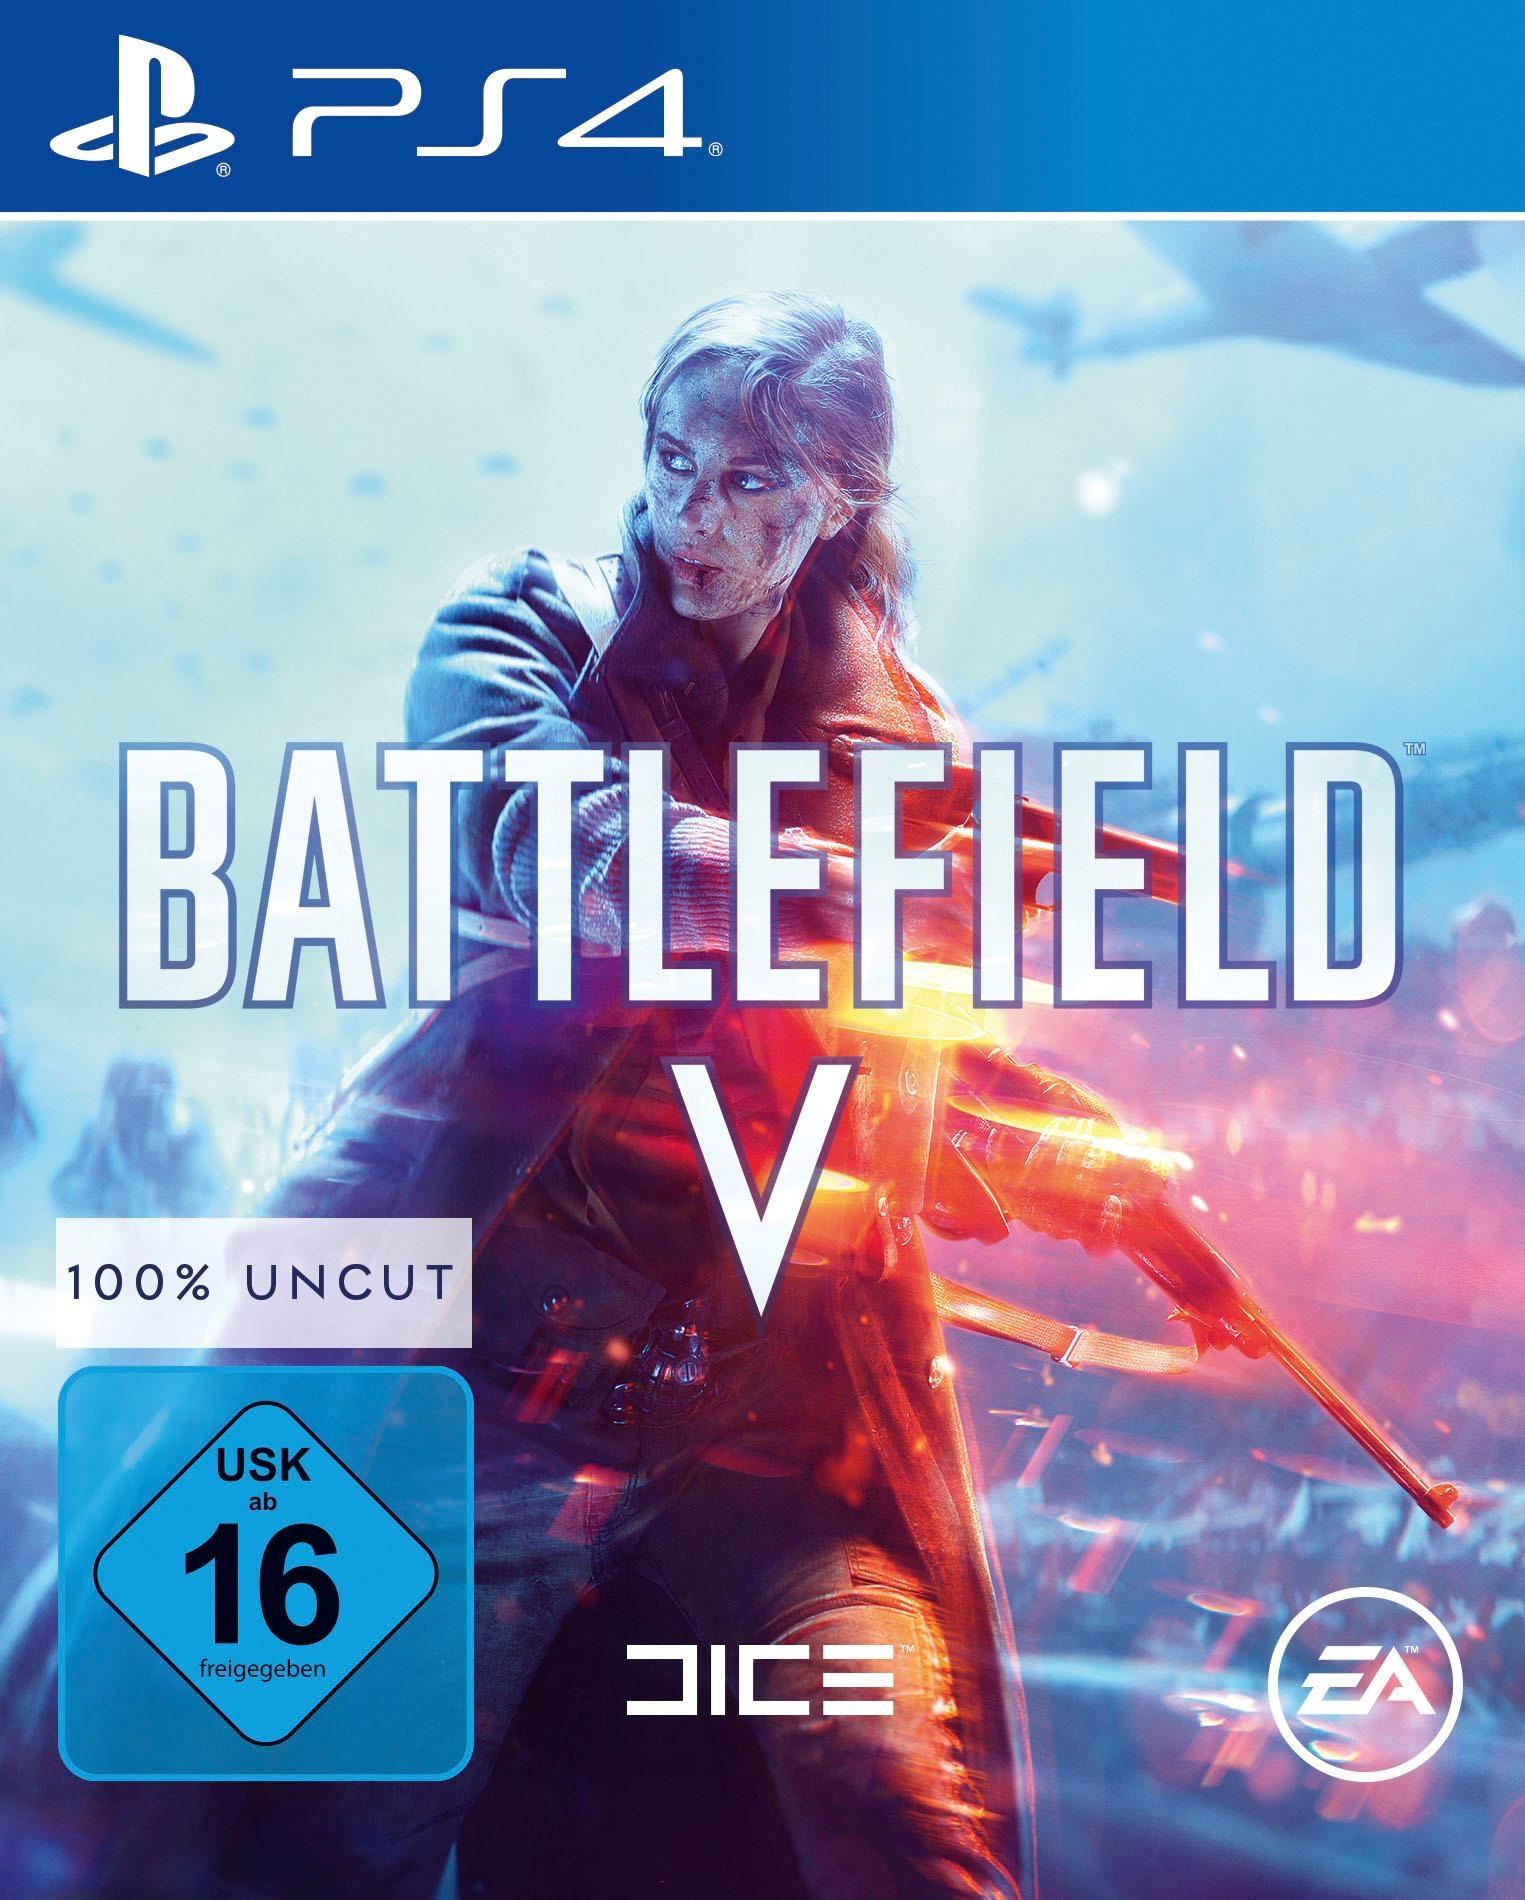 Image of Battlefield V PlayStation 4